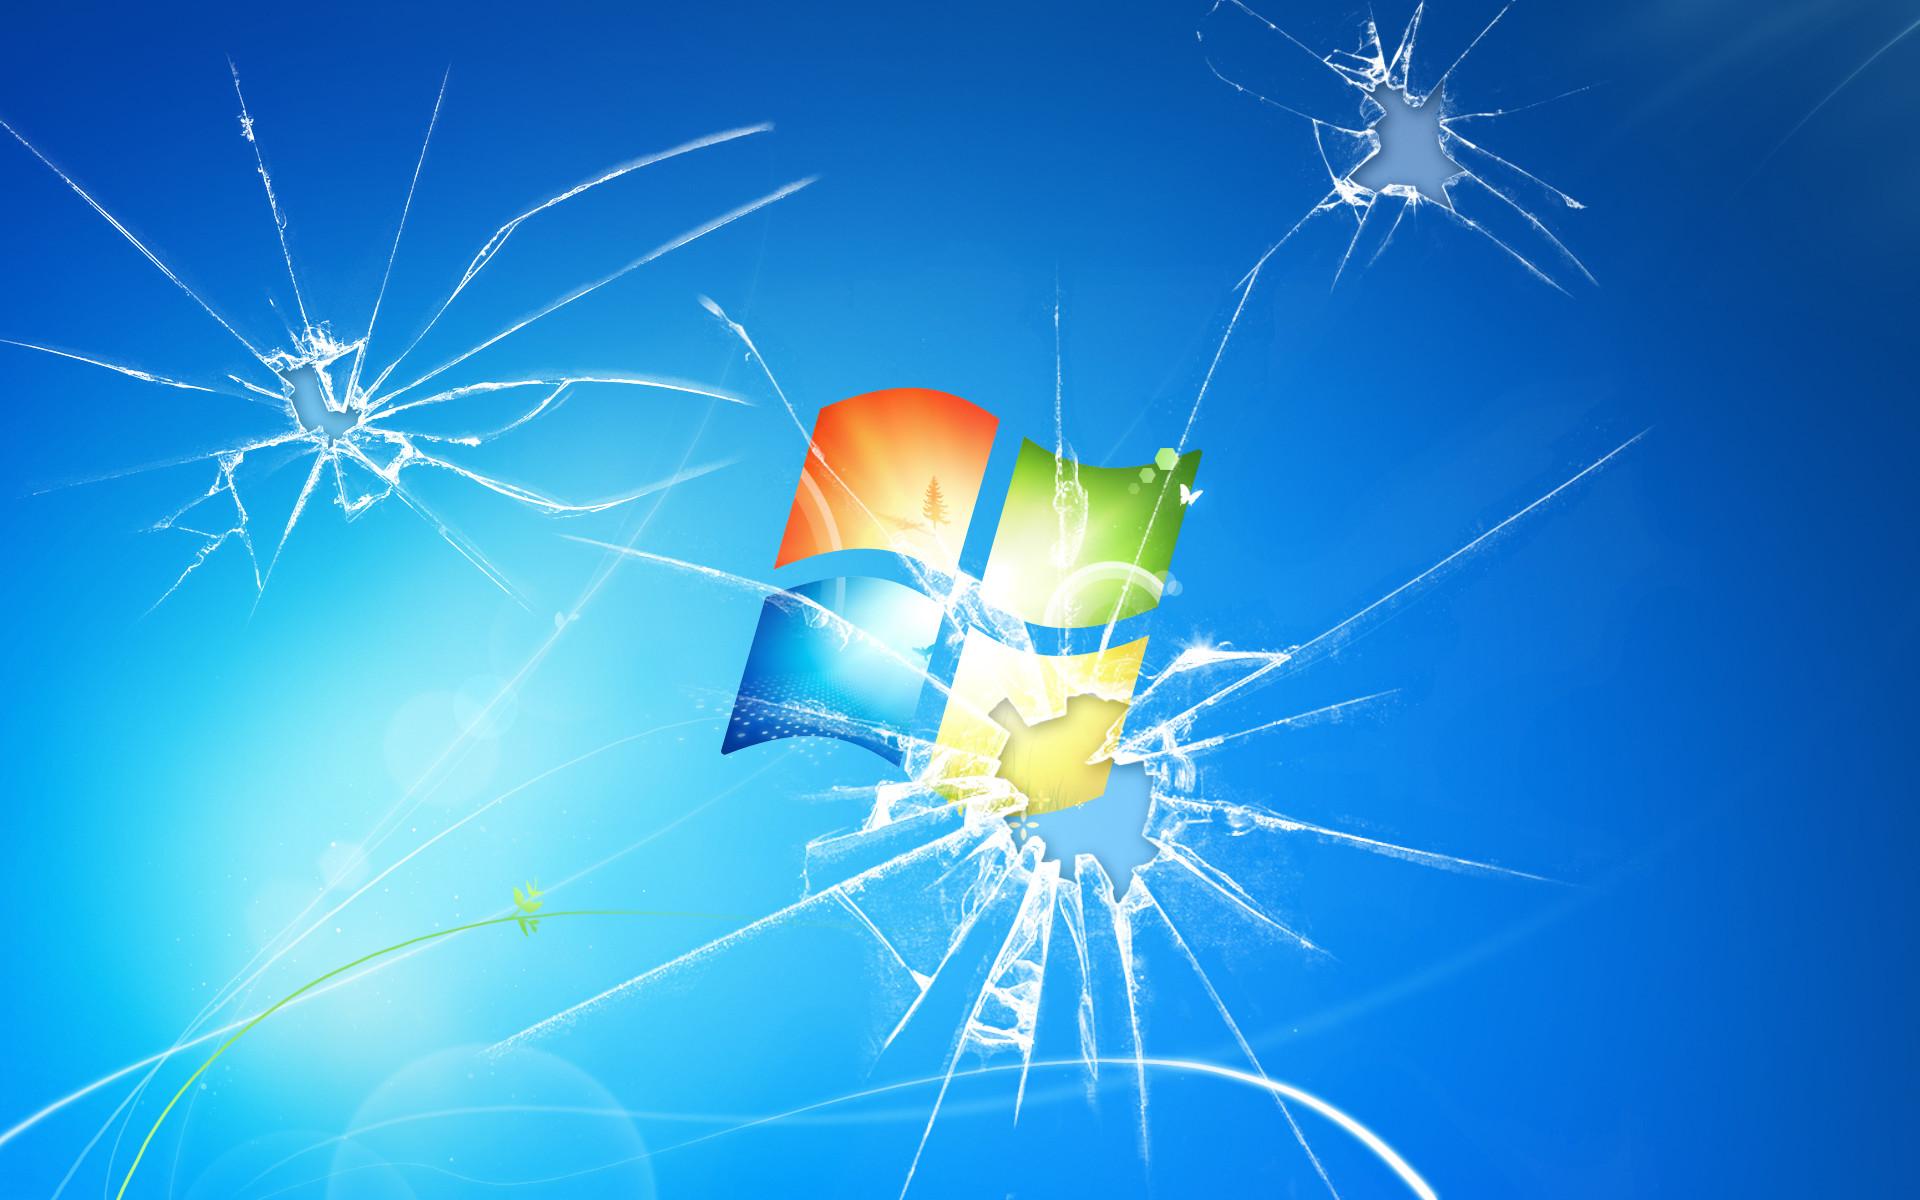 Cracked Screen Wallpaper Iphone 6 Cracked Screen Wallpaper Windows 10 77 Images